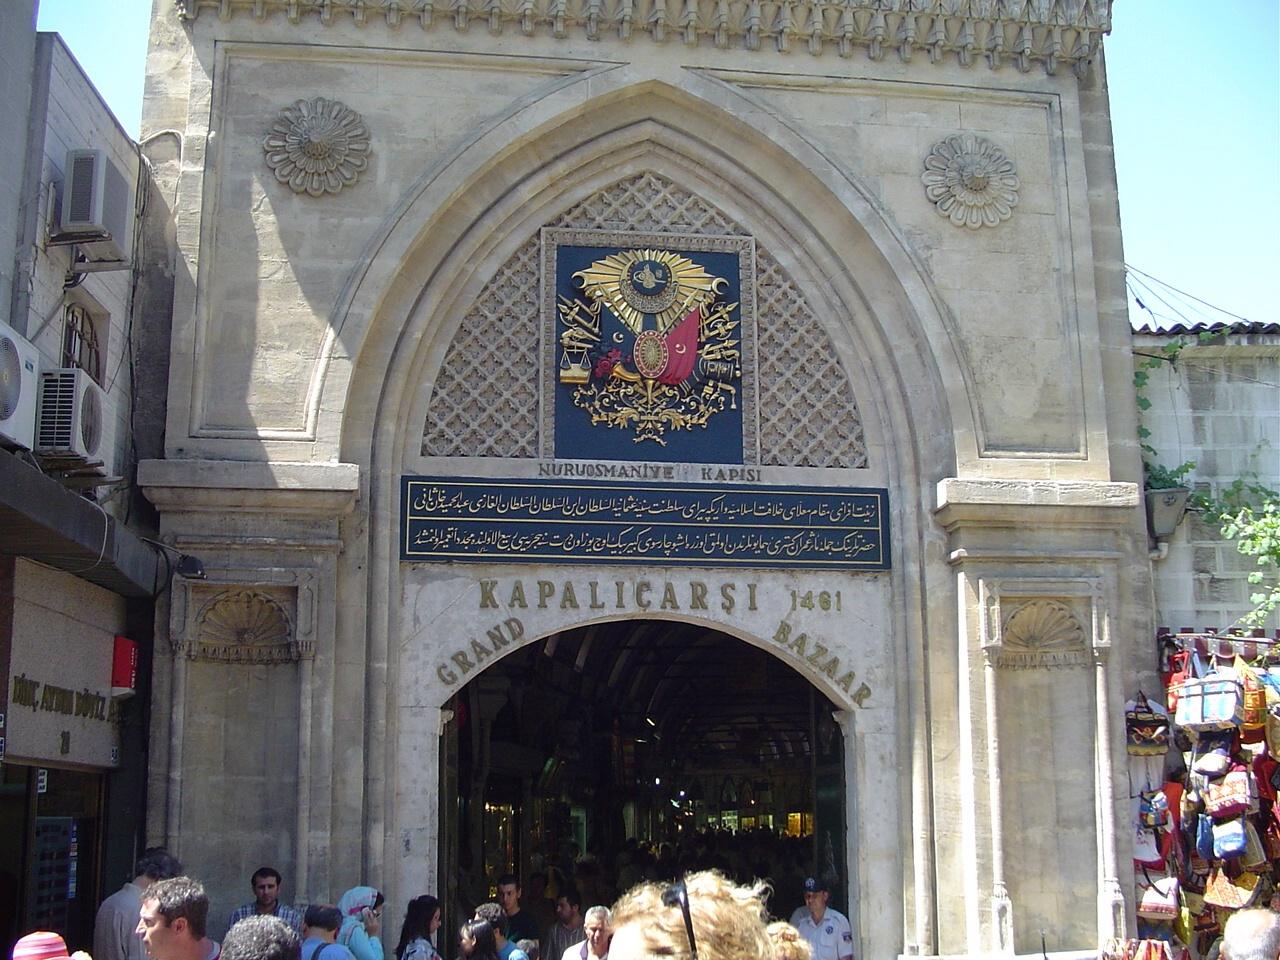 File:Entrance of Grand Bazaar Istanbul (2834699565).jpg - Wikimedia Commons